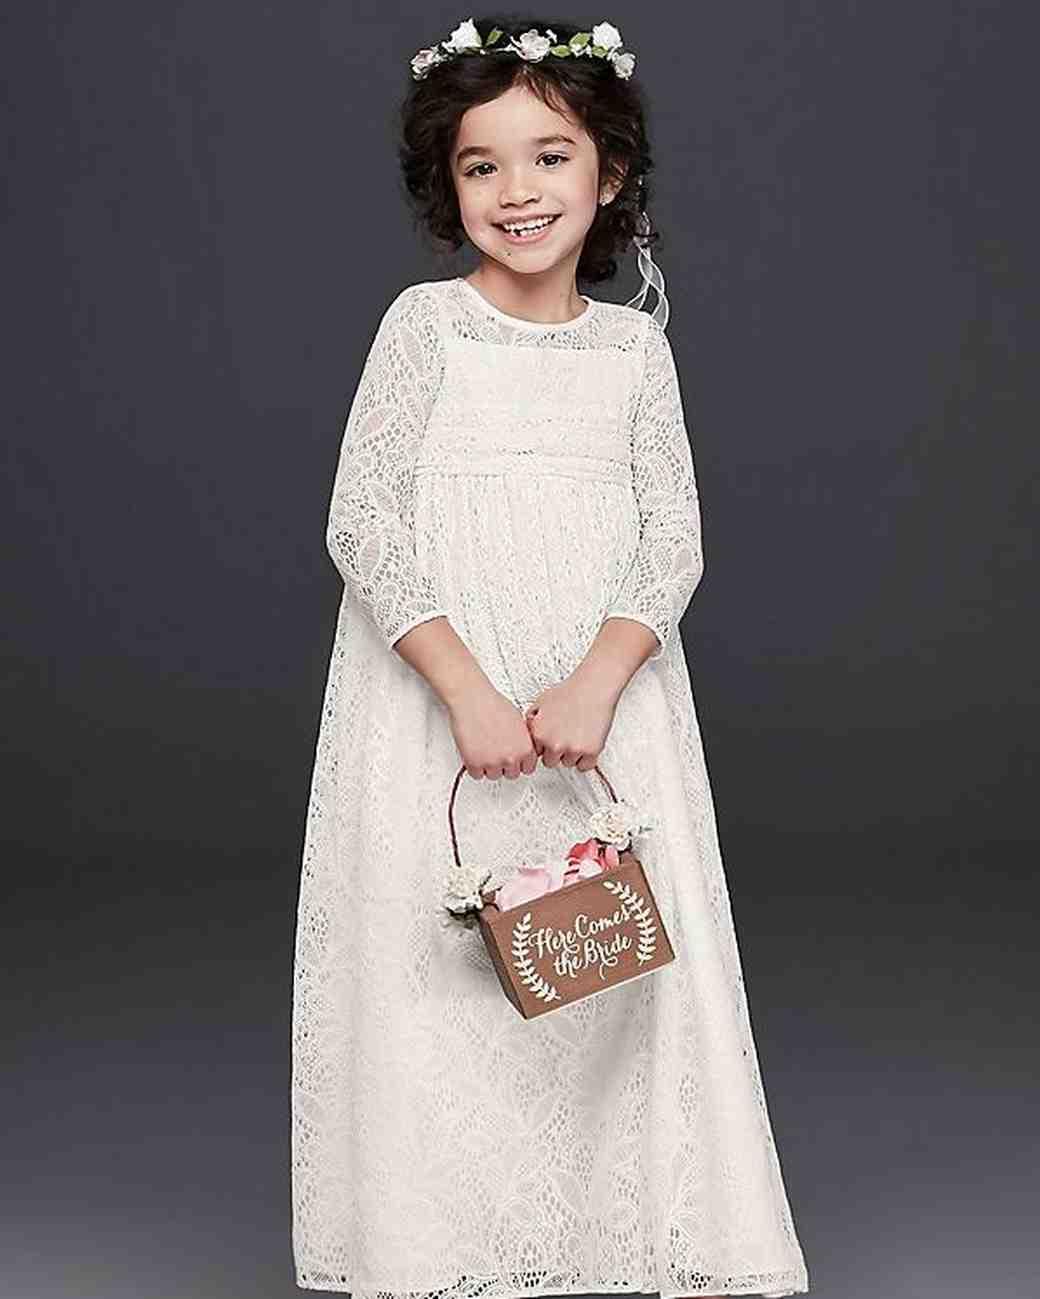 cd47869c1d lace crochet flower girl dress from davids bridal